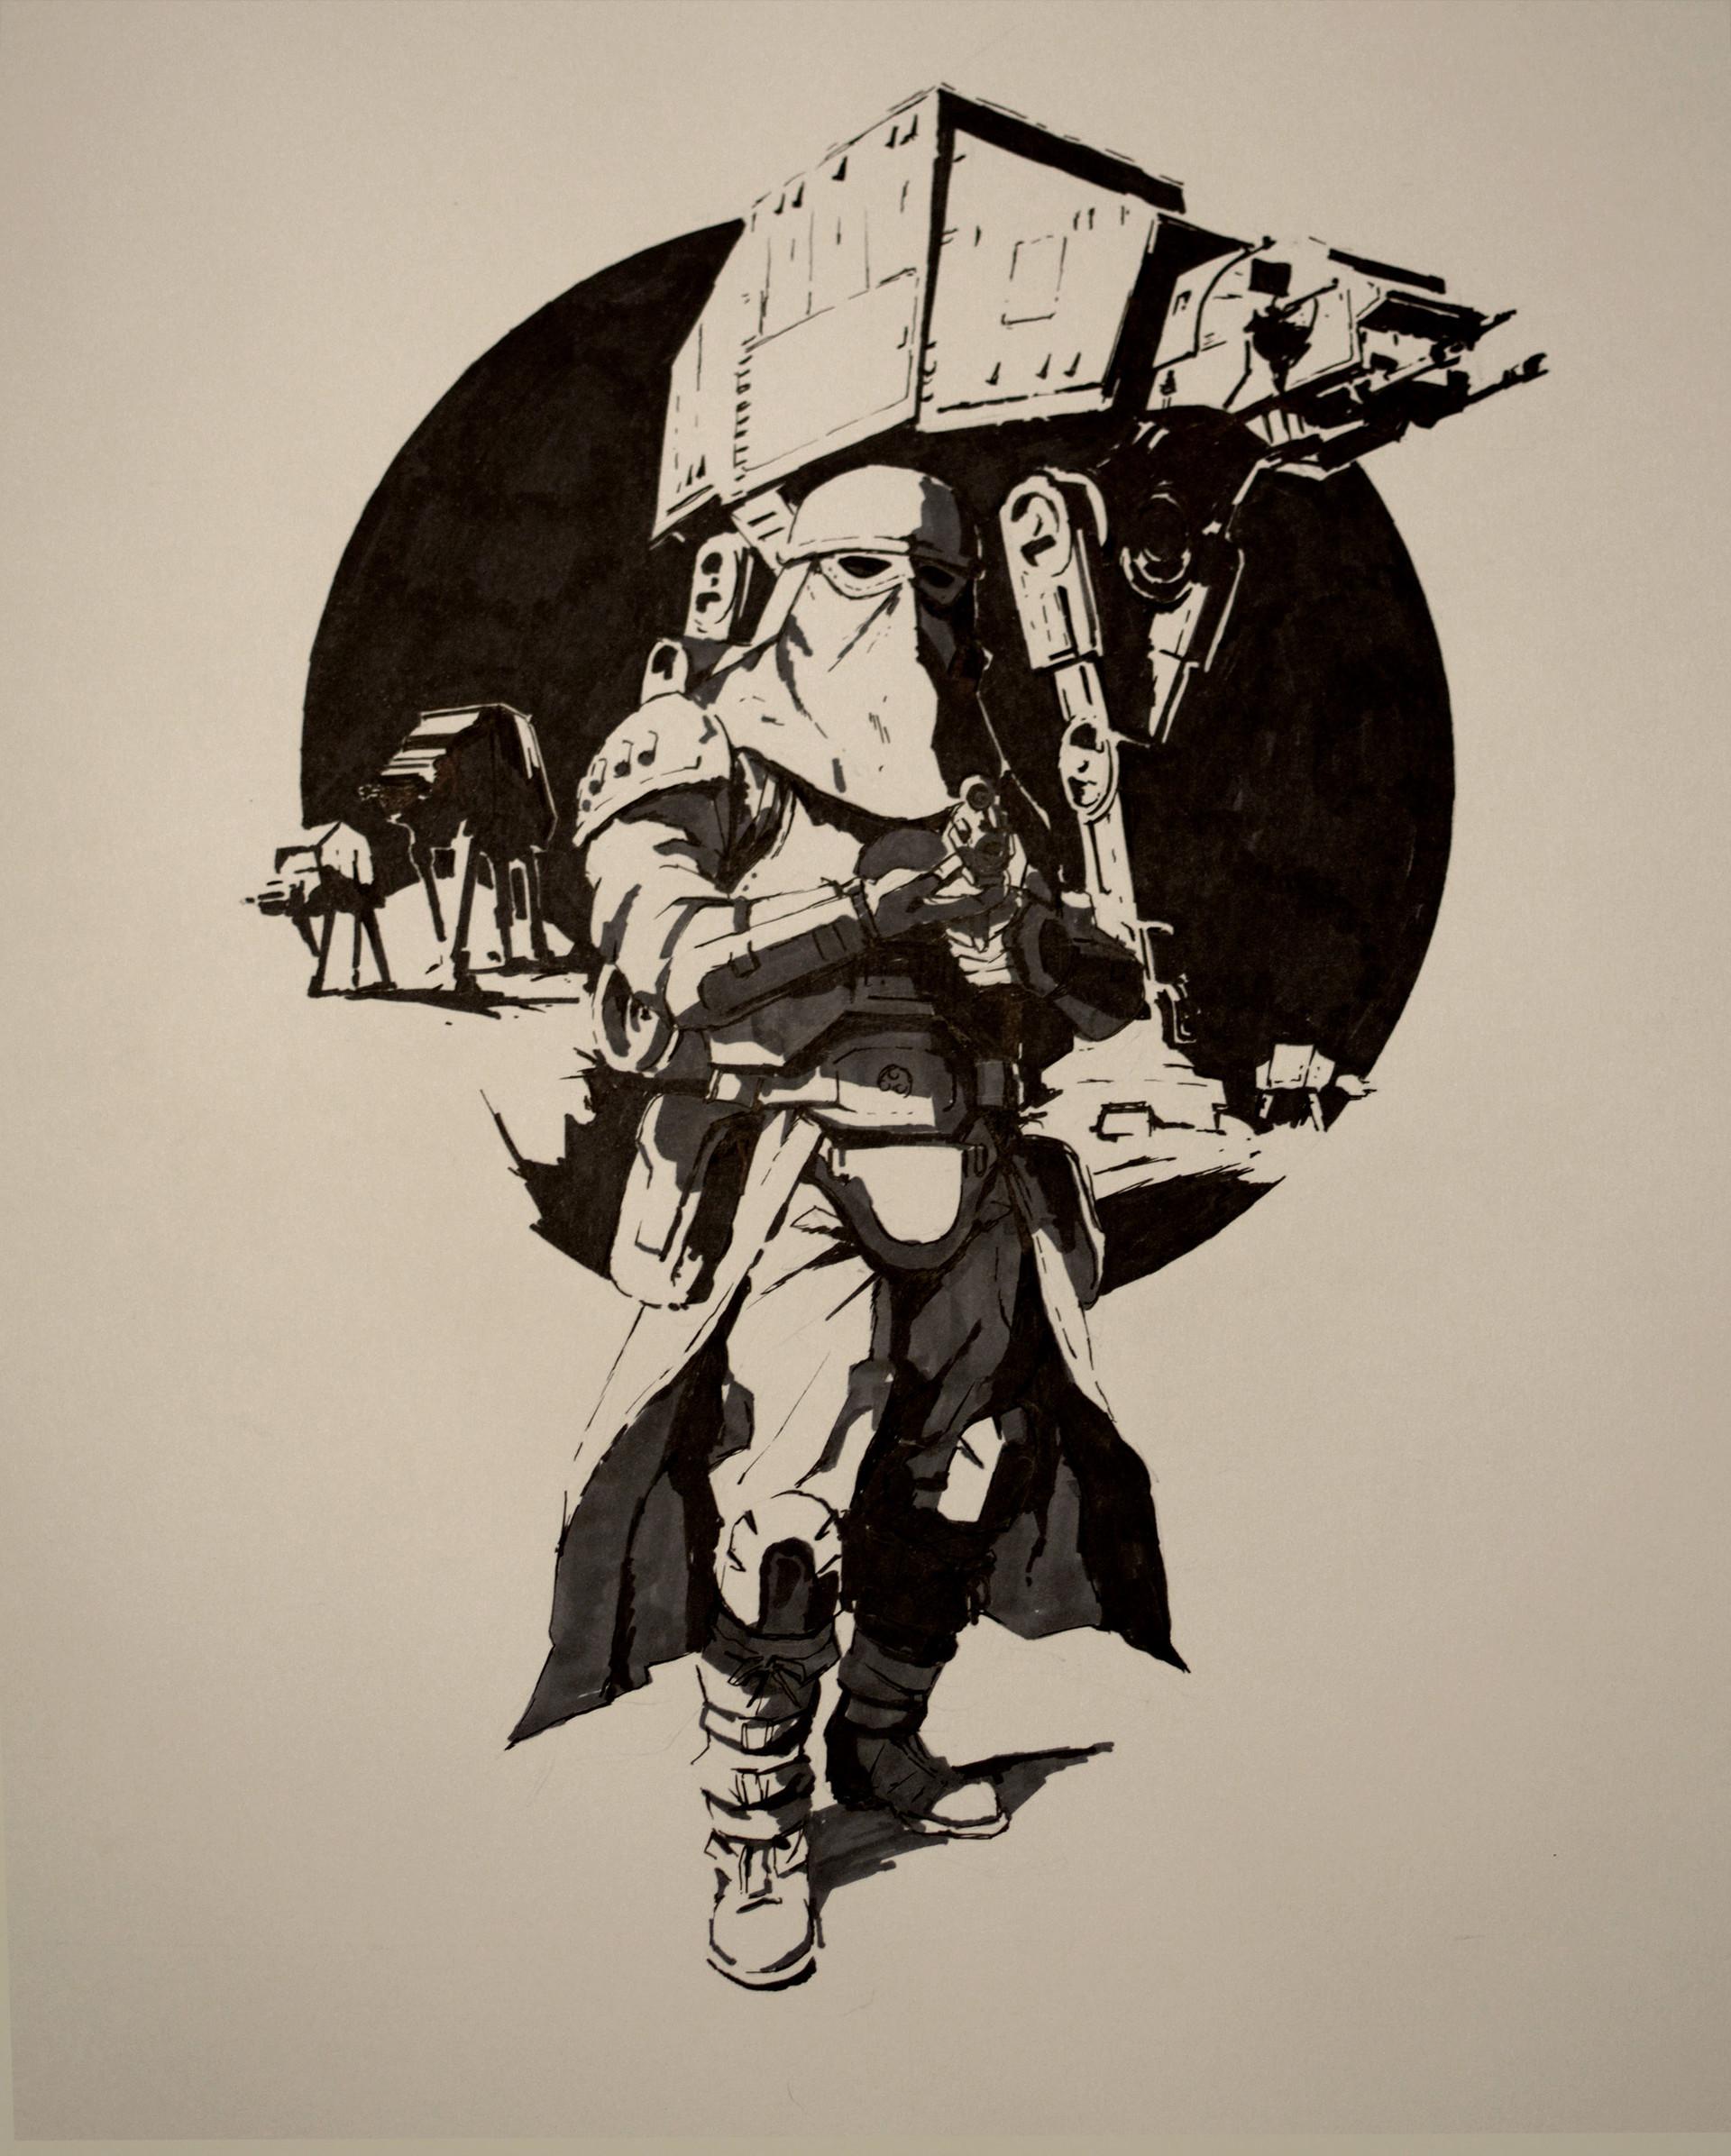 Artstation - Snowtrooper Ink Paper Guillaume Menuel